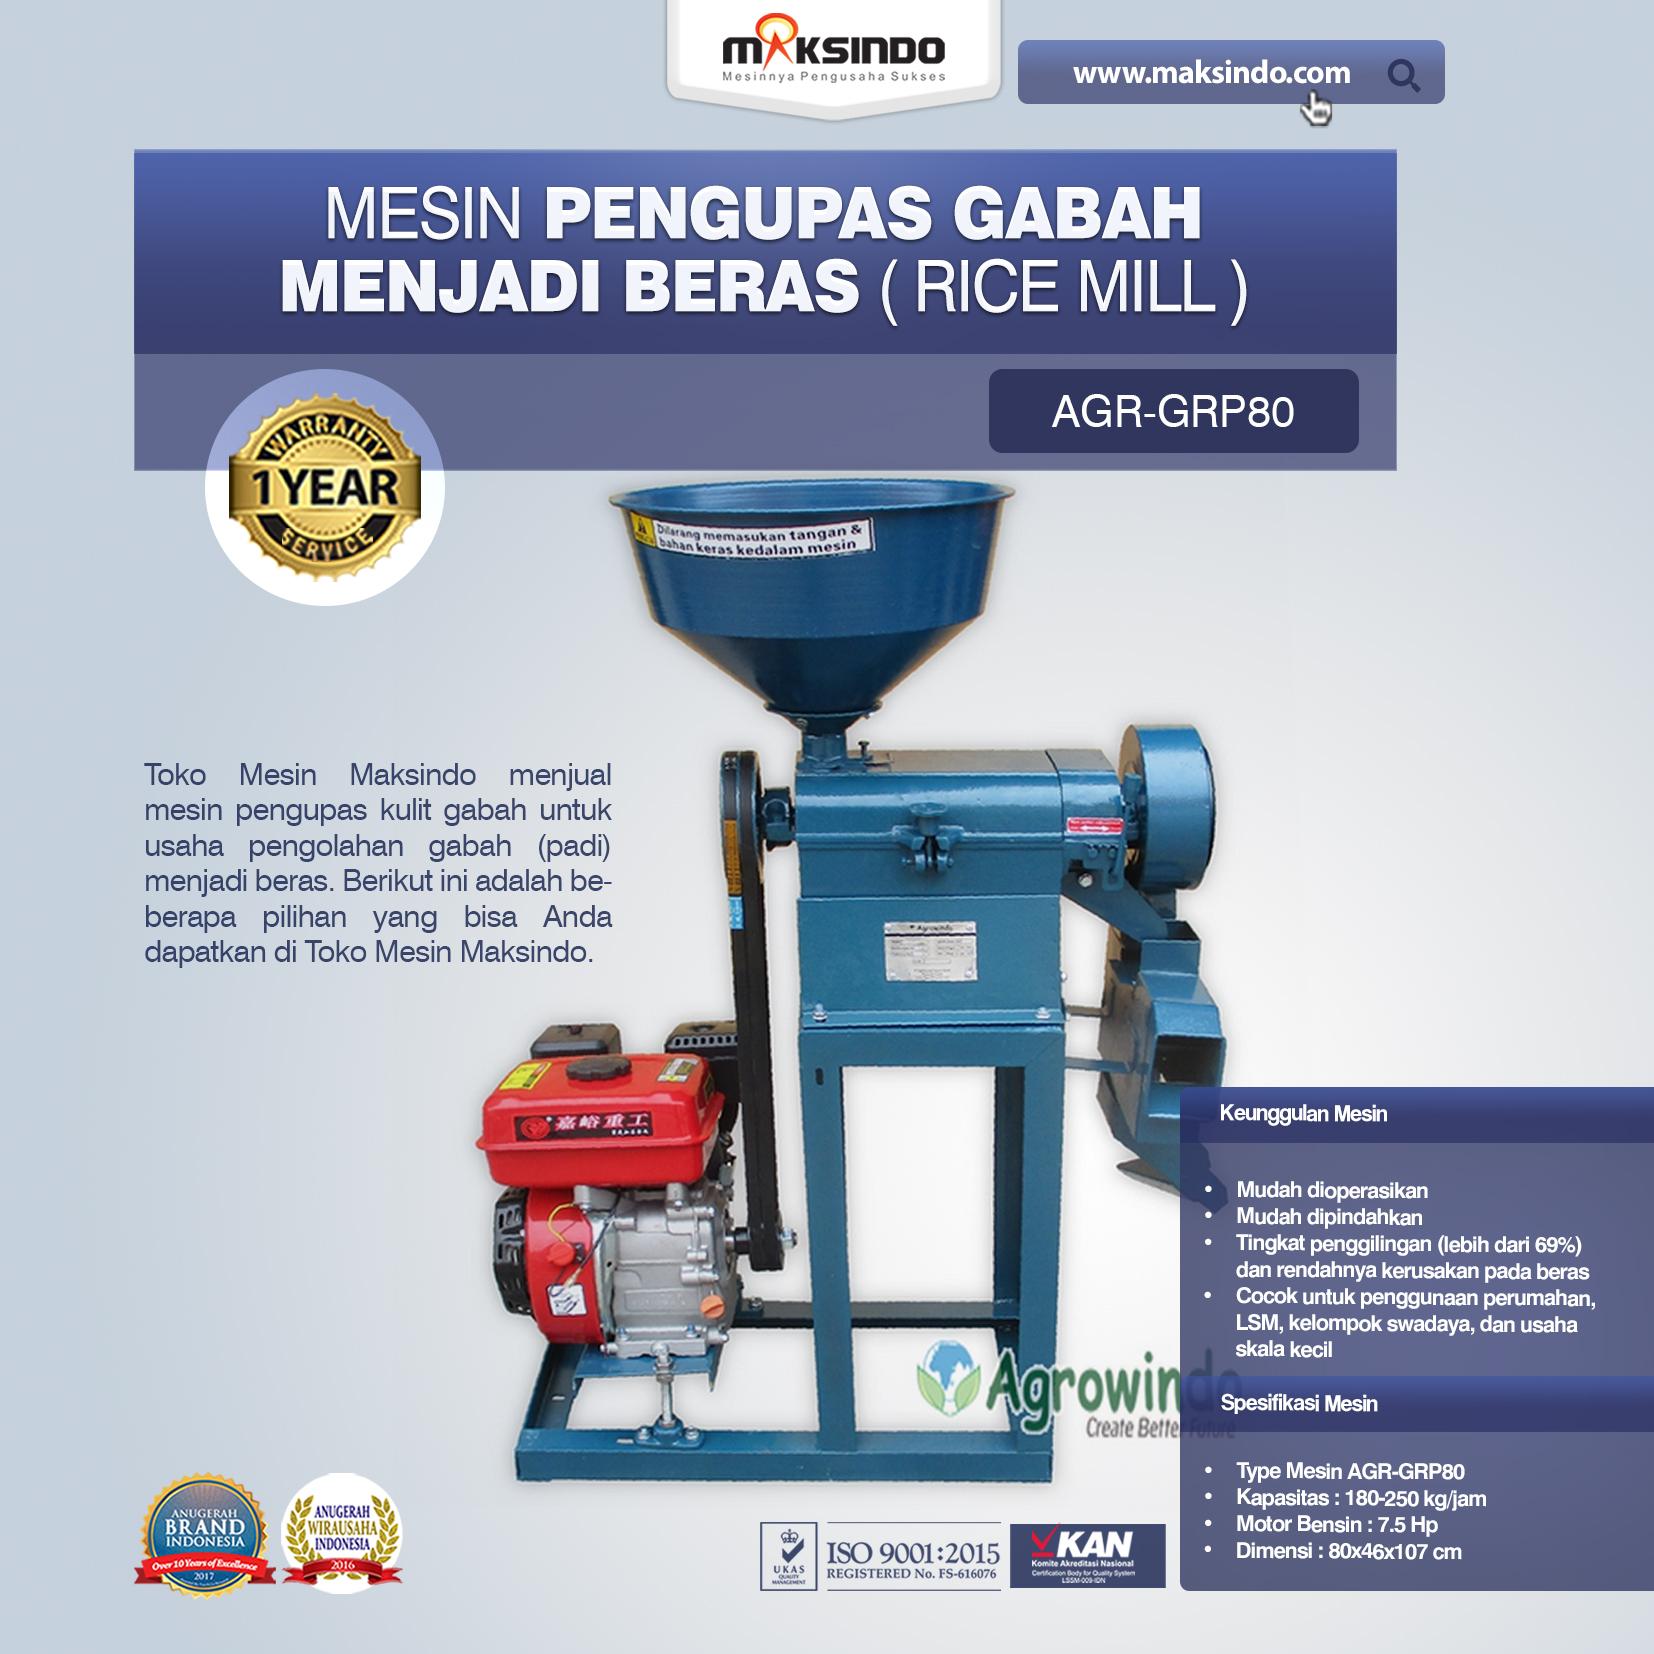 Jual Mesin Pengupas Gabah Menjadi Beras (Rice Mill) AGR-GRP80 di Malang